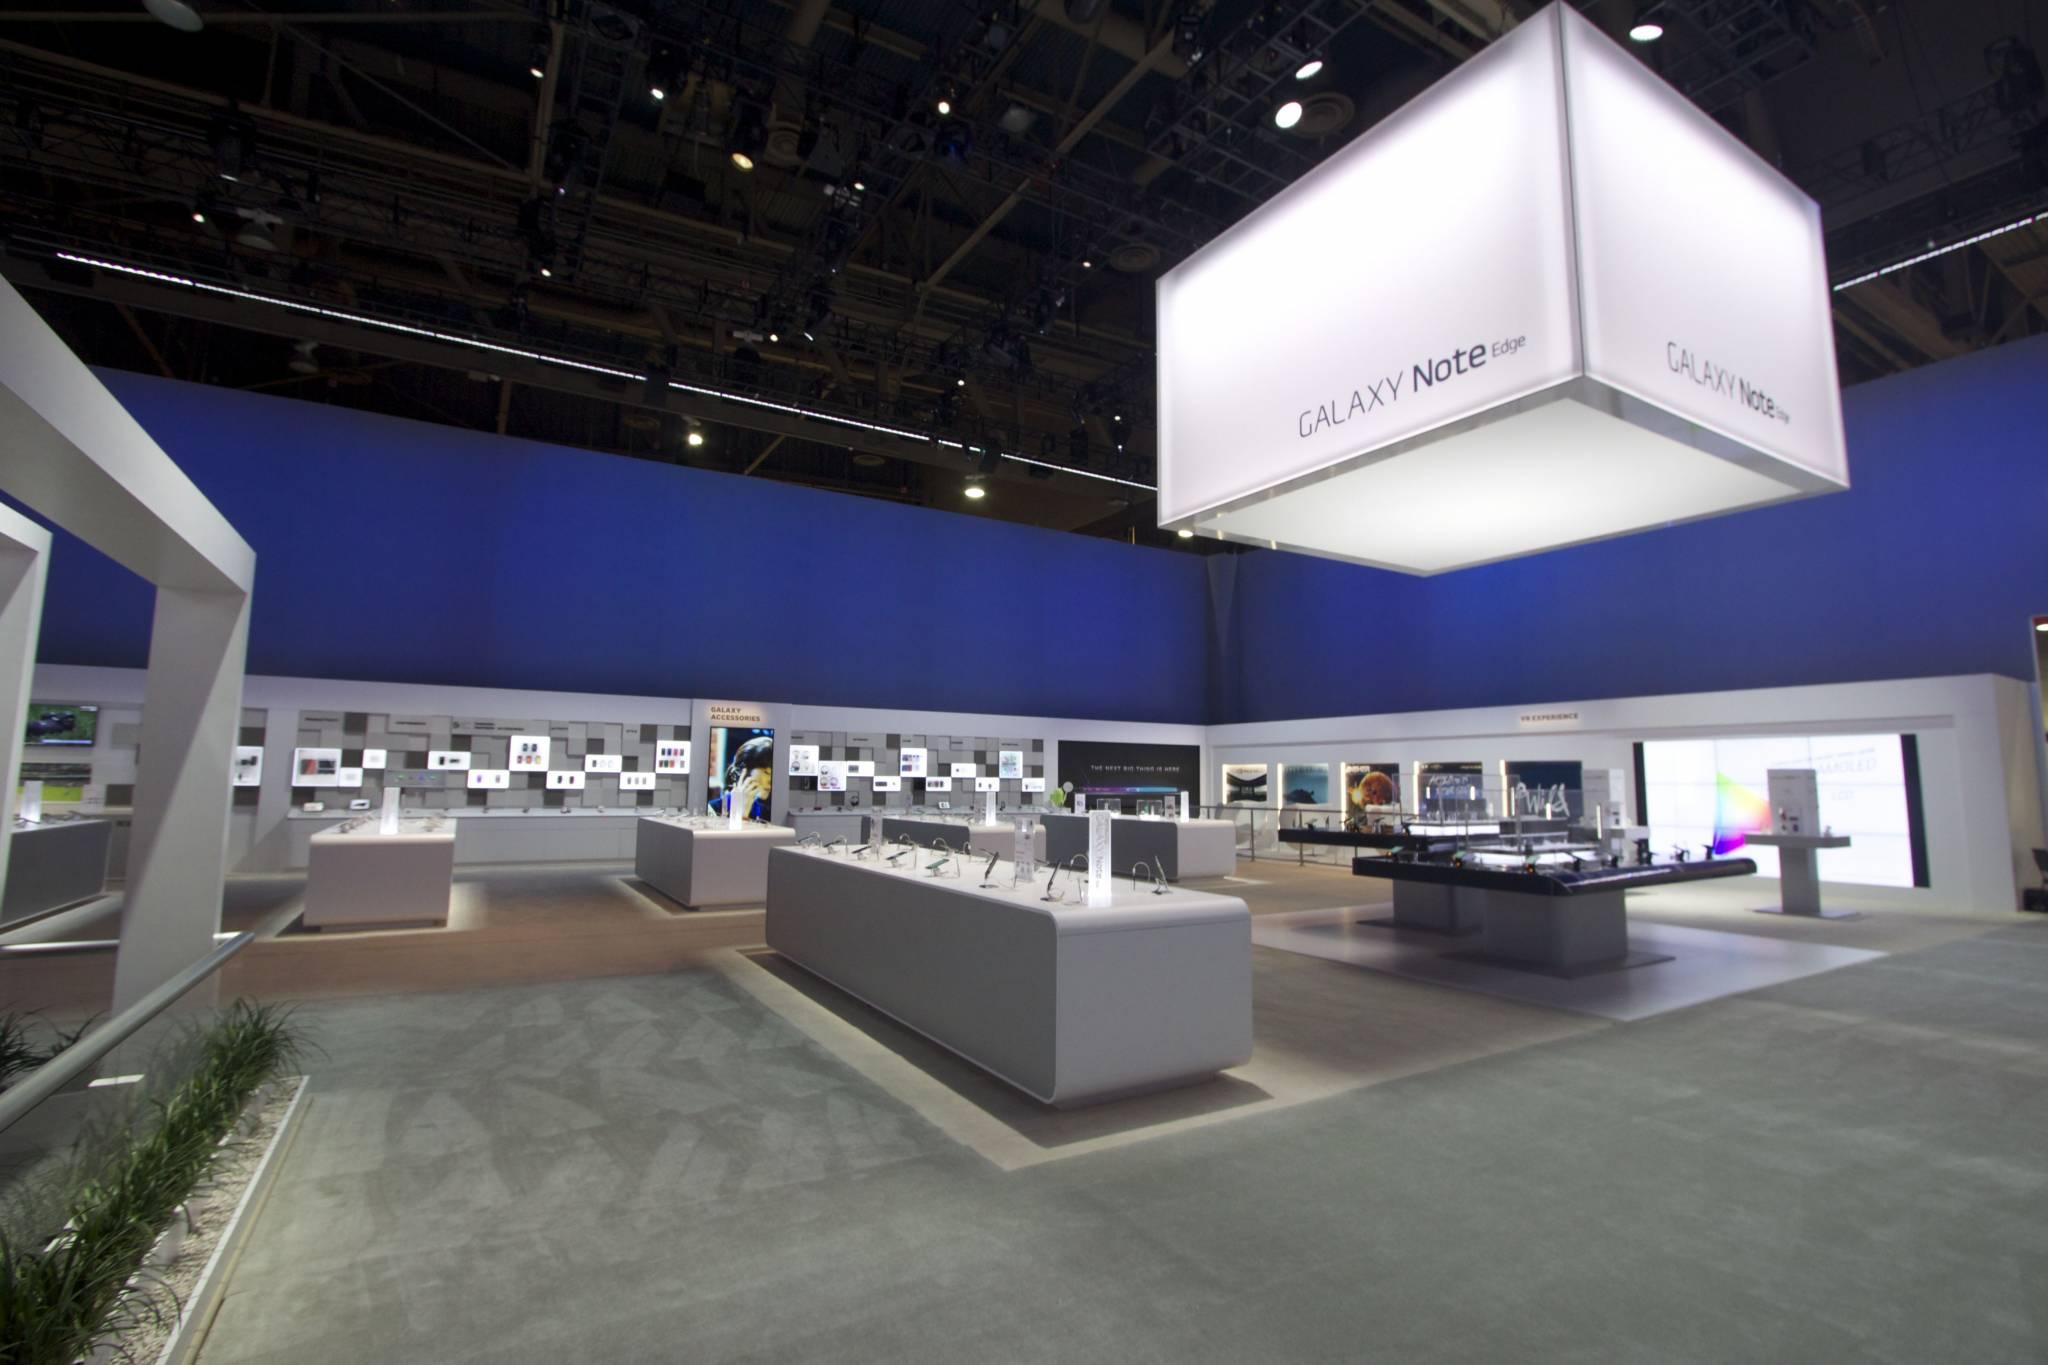 Samsung Ces 2017 Exhibit Lighting